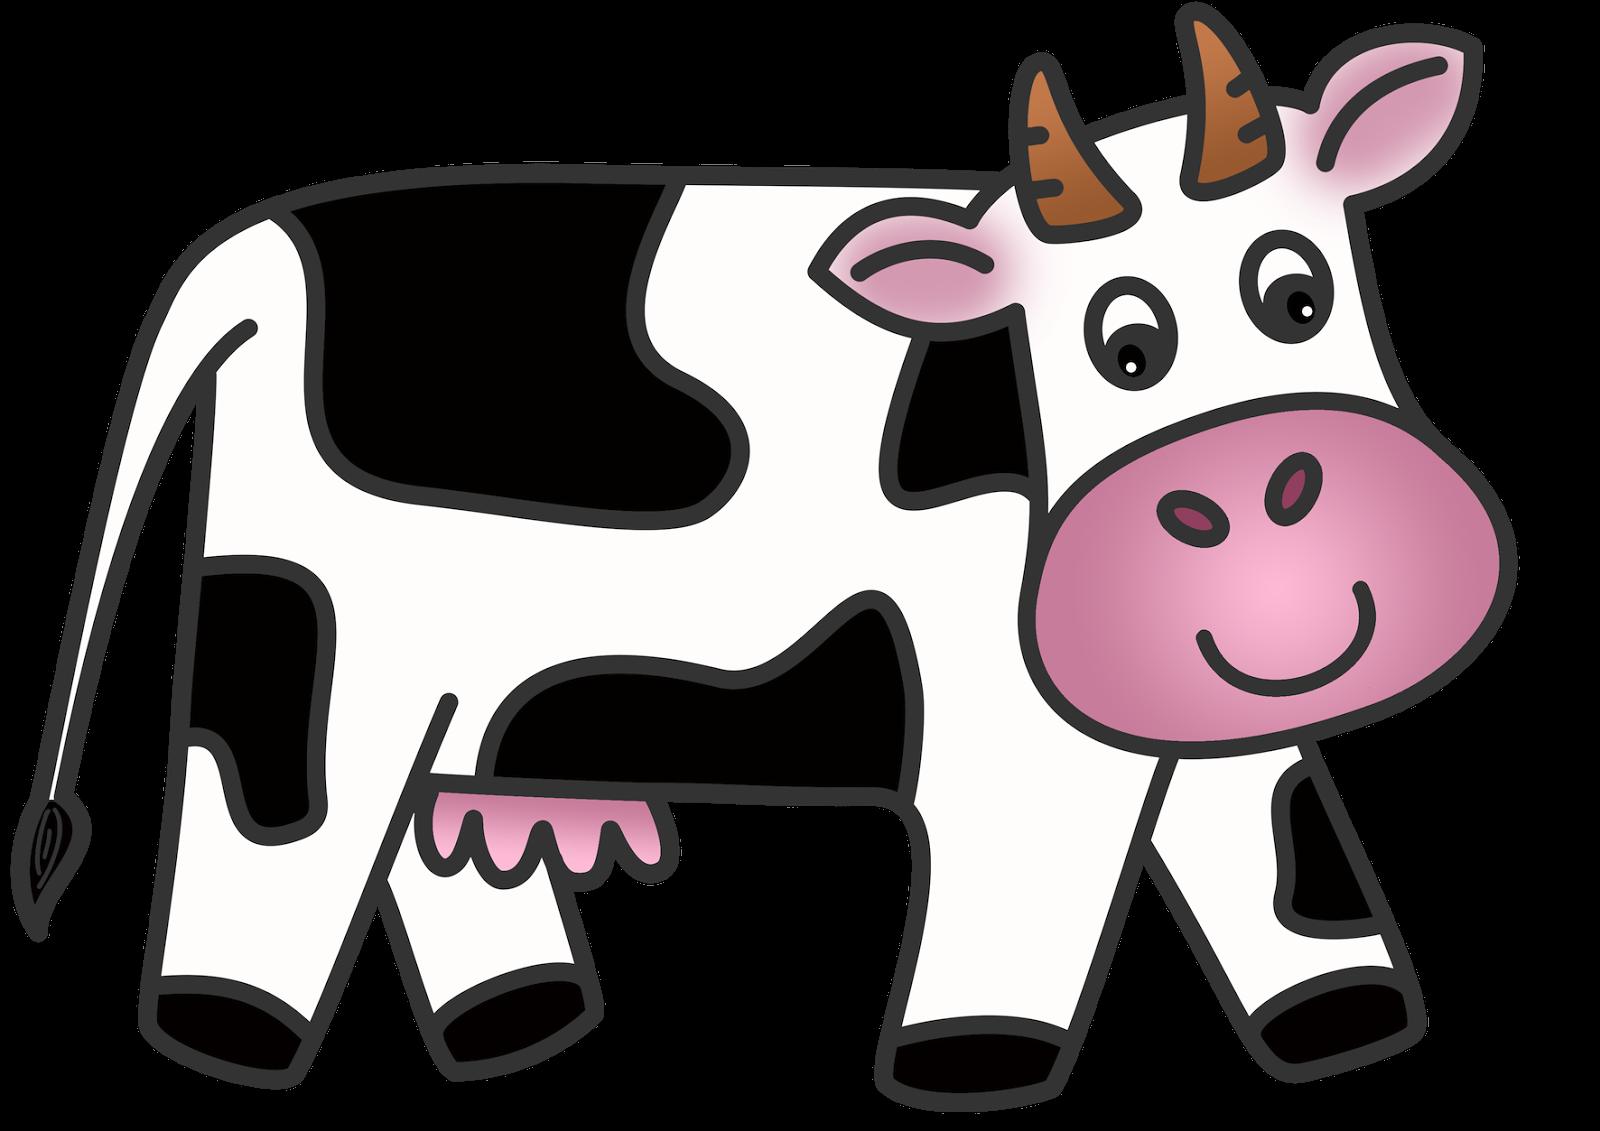 Dairy Cow Clip Art - ClipArt Best